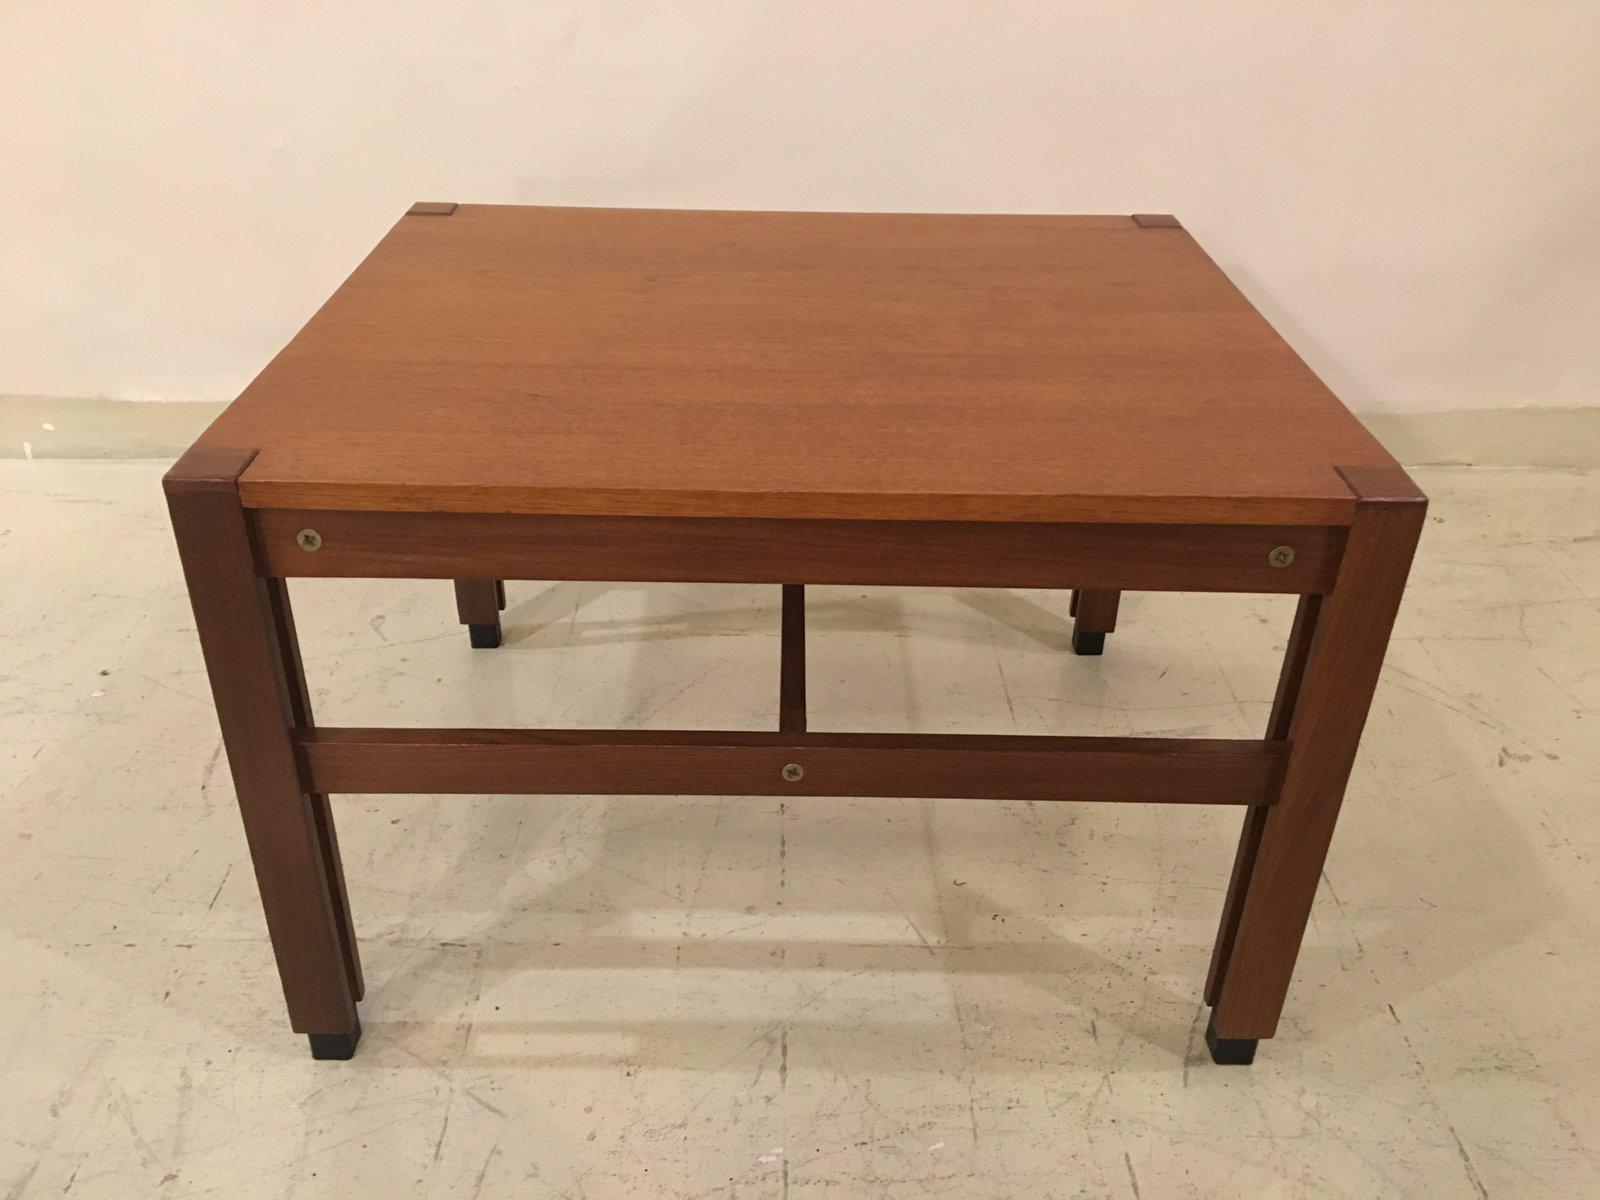 Arona low table by ico luisa parisi for mim mobili for Mobili moderni italiani